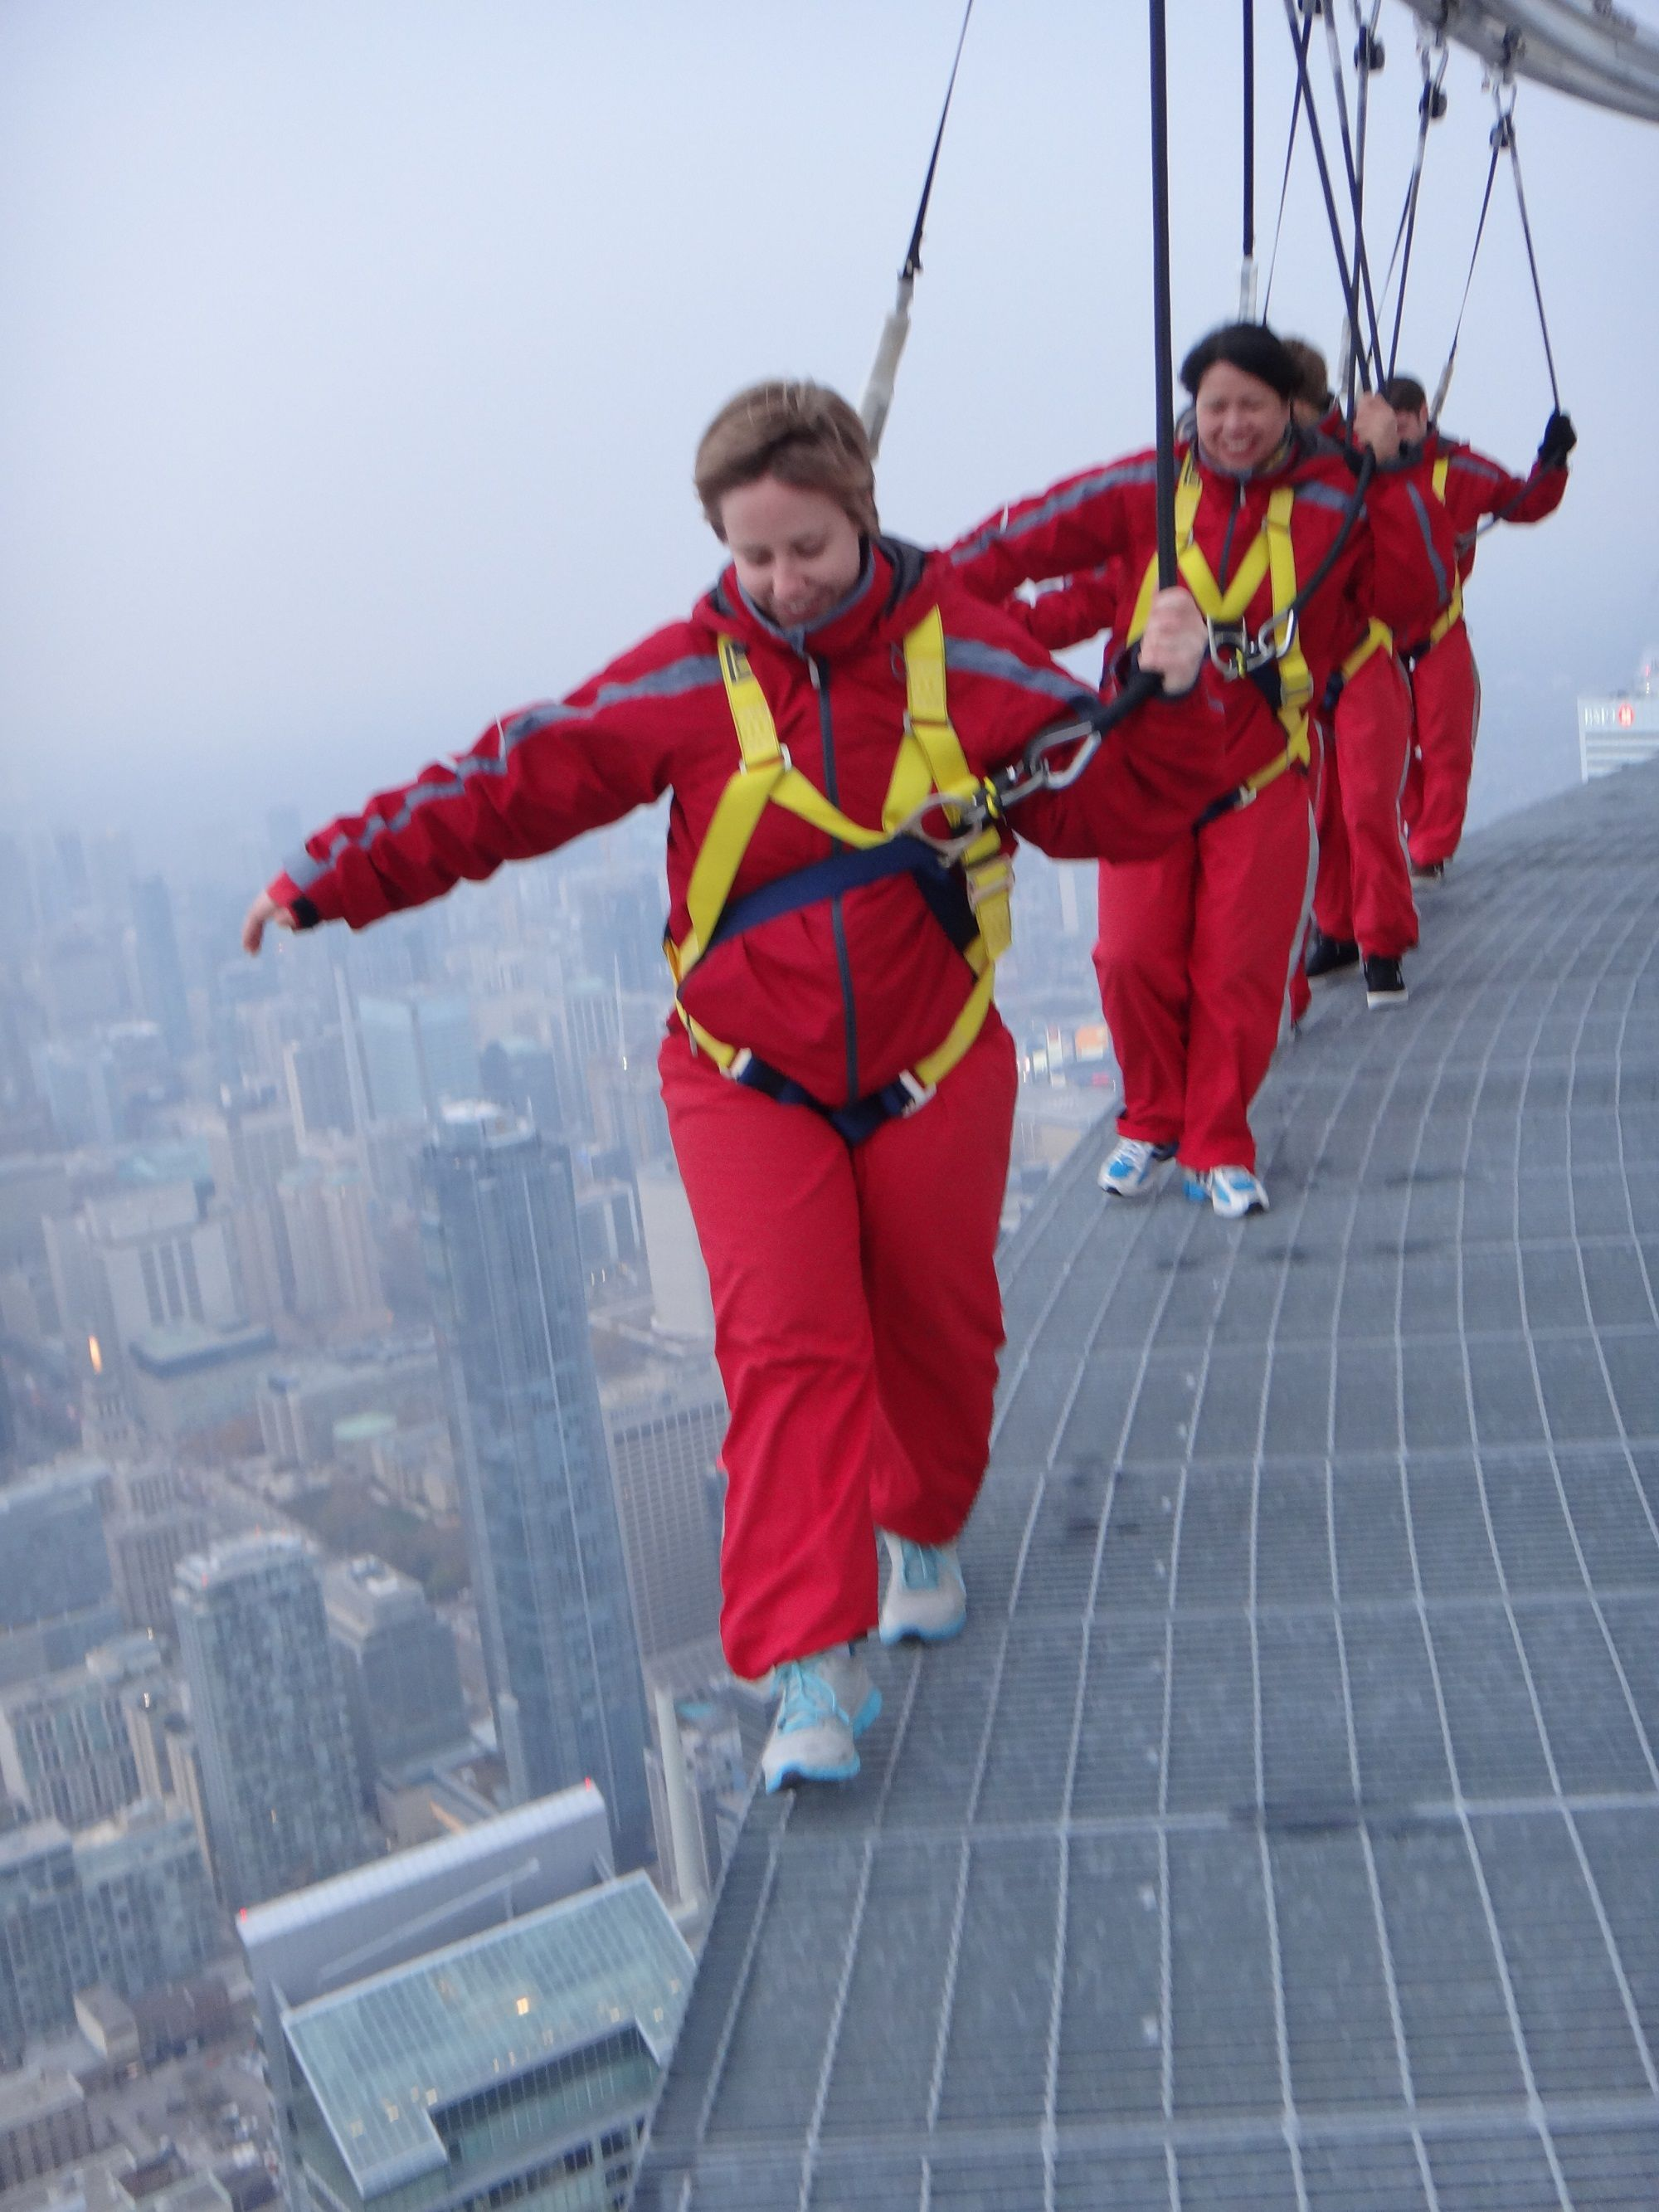 baby steps, CN Tower Edge Walk, November 2012 Cloud